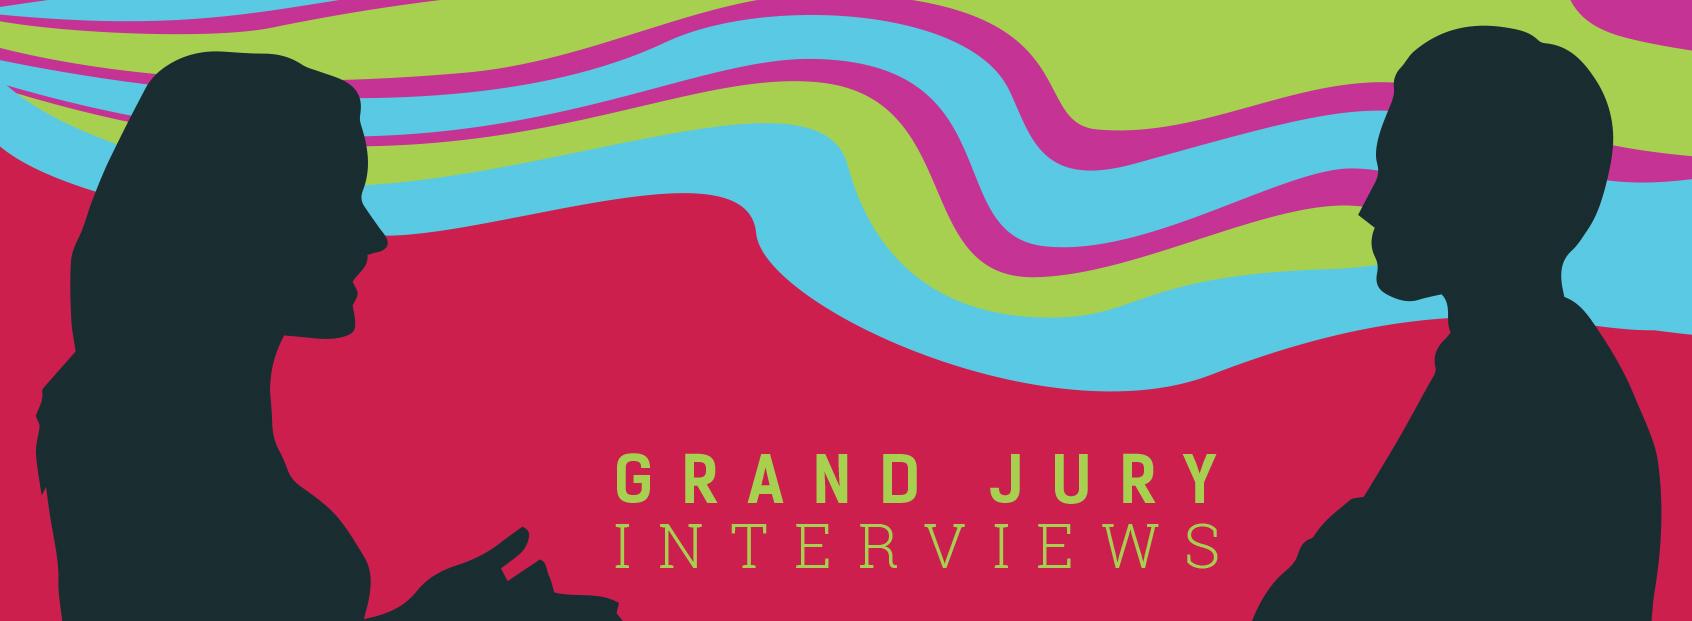 Grand Jury interviews graphic.01.jpg